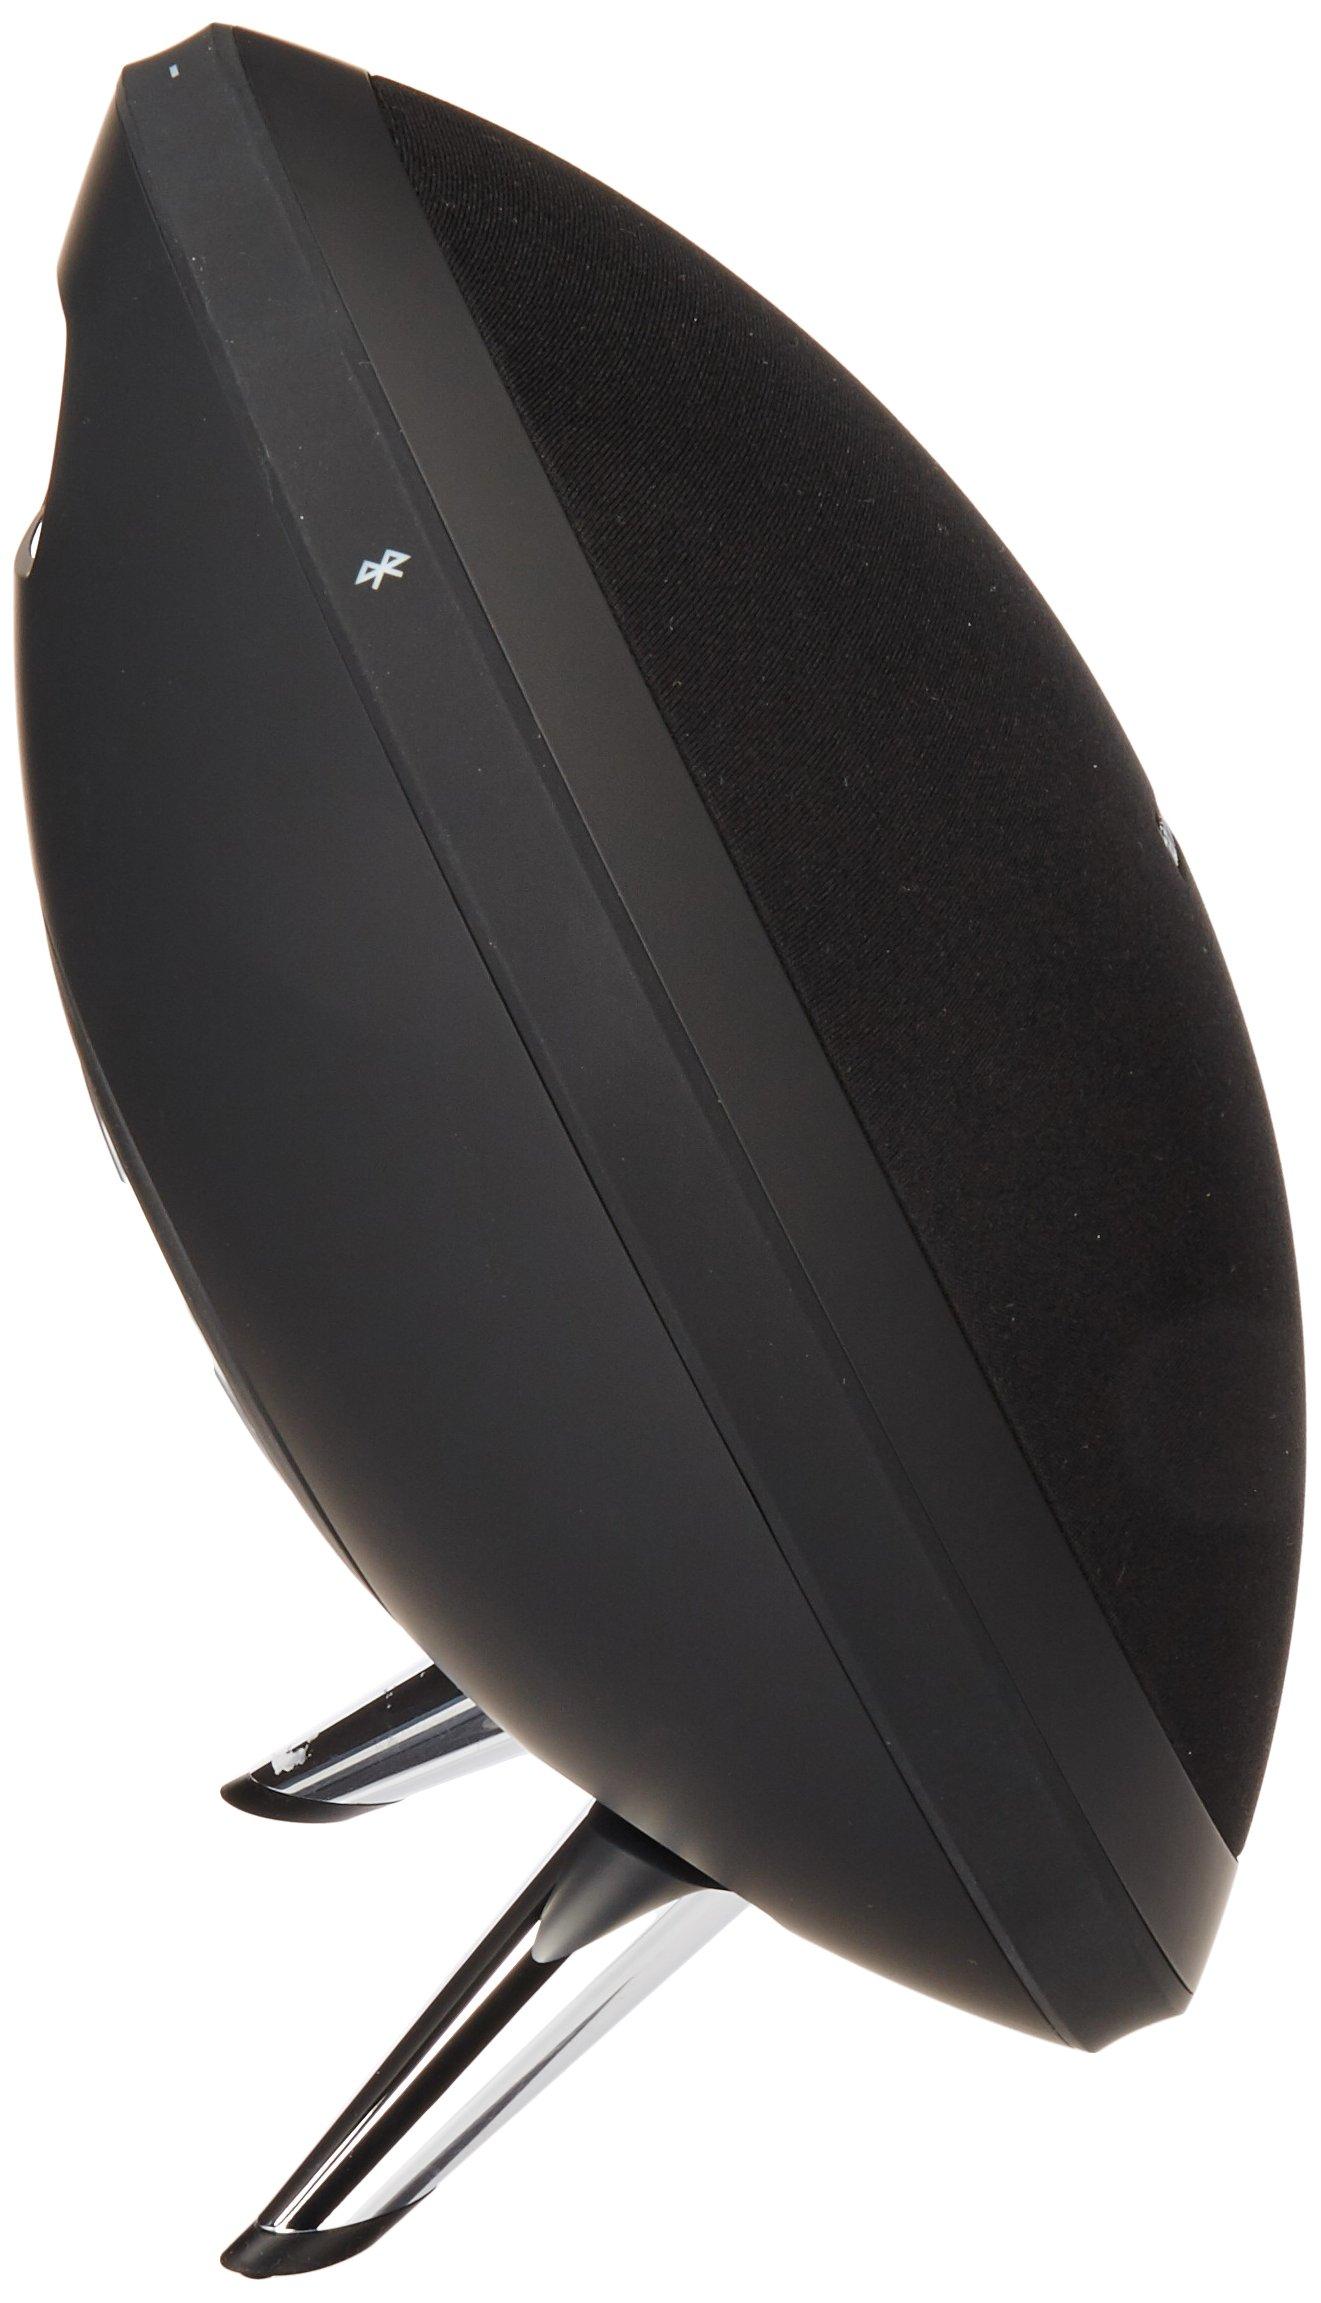 Harman Kardon Onyx Studio Wireless Bluetooth Speaker with rechargeable battery by Harman Kardon (Image #3)